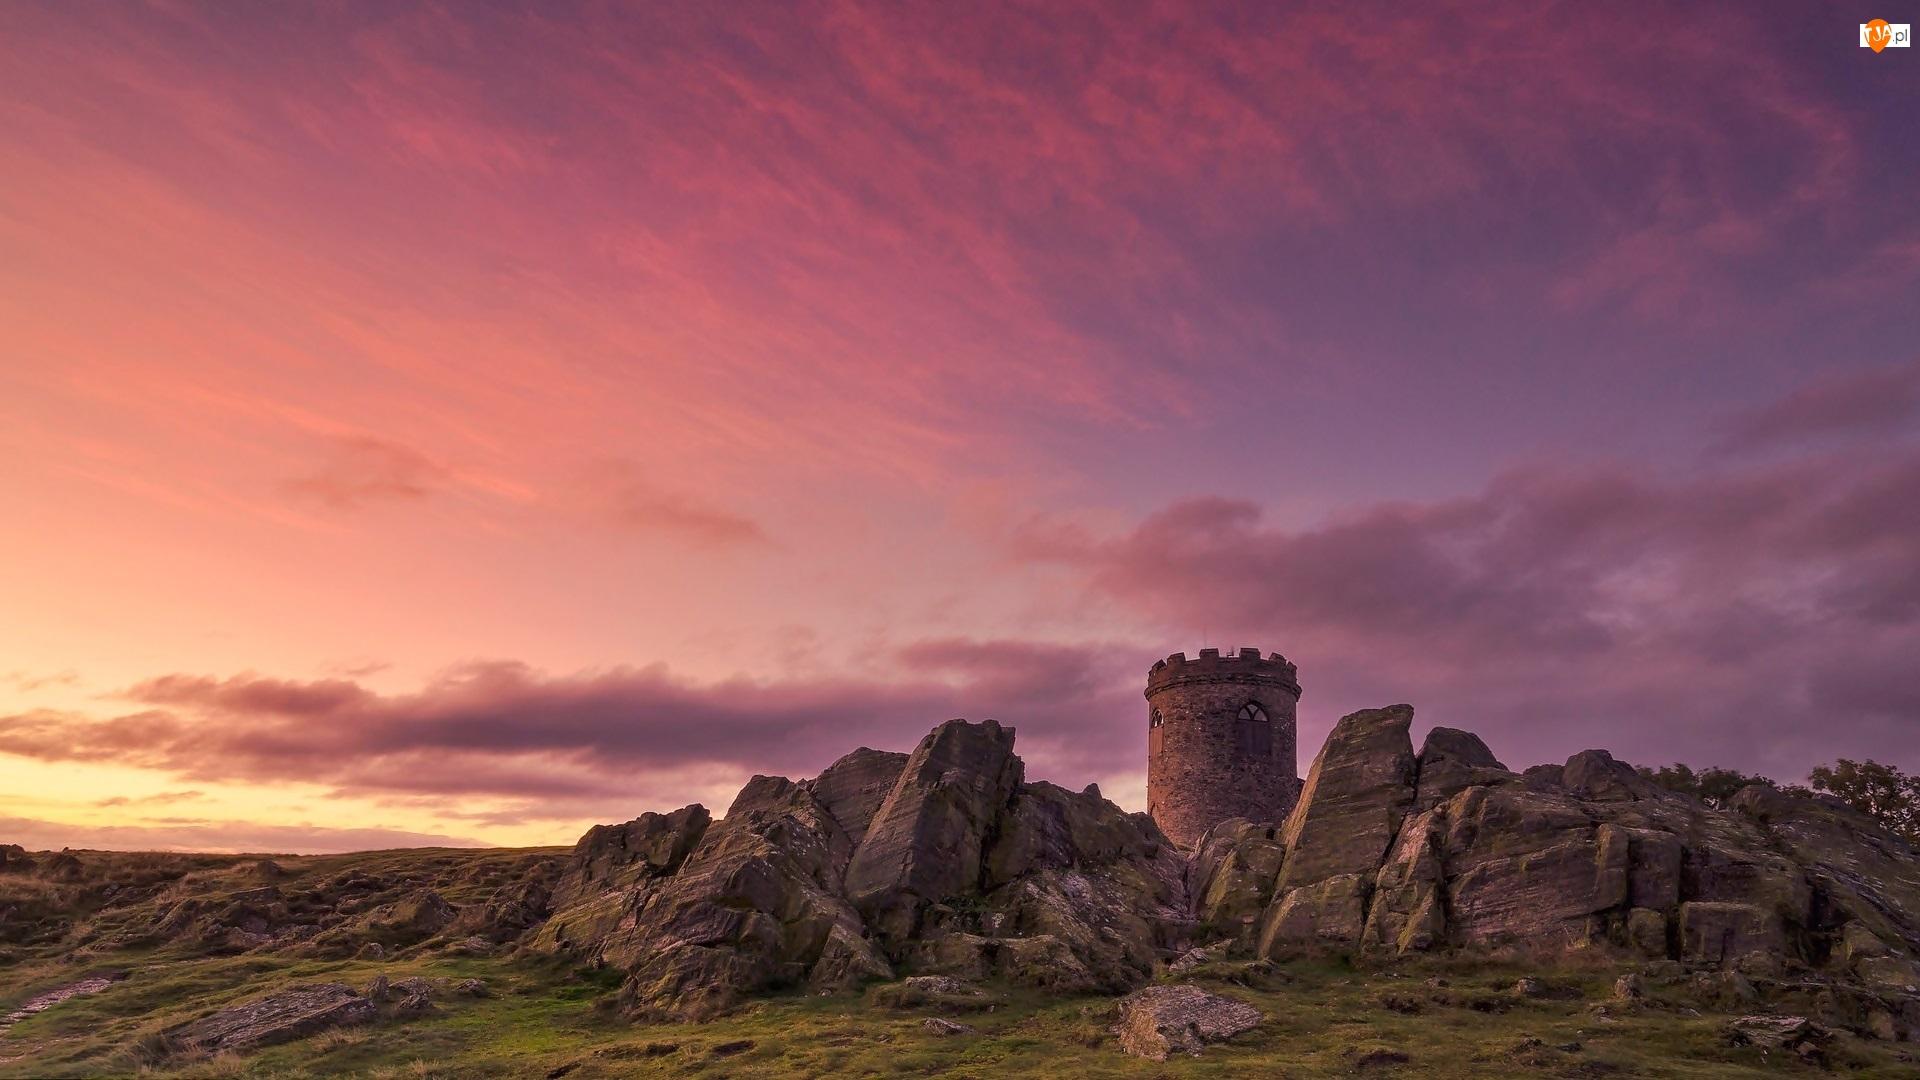 Zachód słońca, Anglia, Park publiczny Bradgate Park, Hrabstwo Leicestershire, Wieża Old John Tower